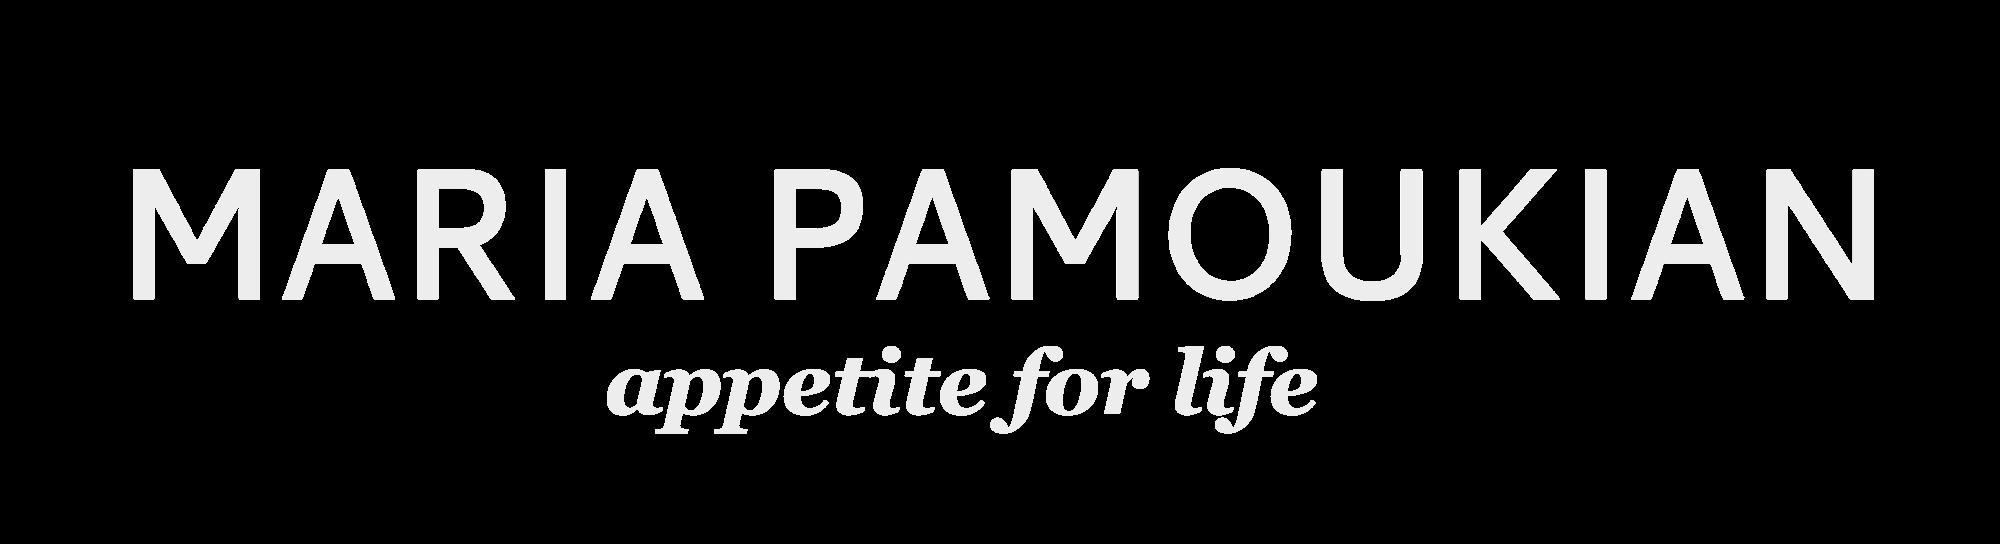 MARIA PAMOUKIAN-logo (5).png